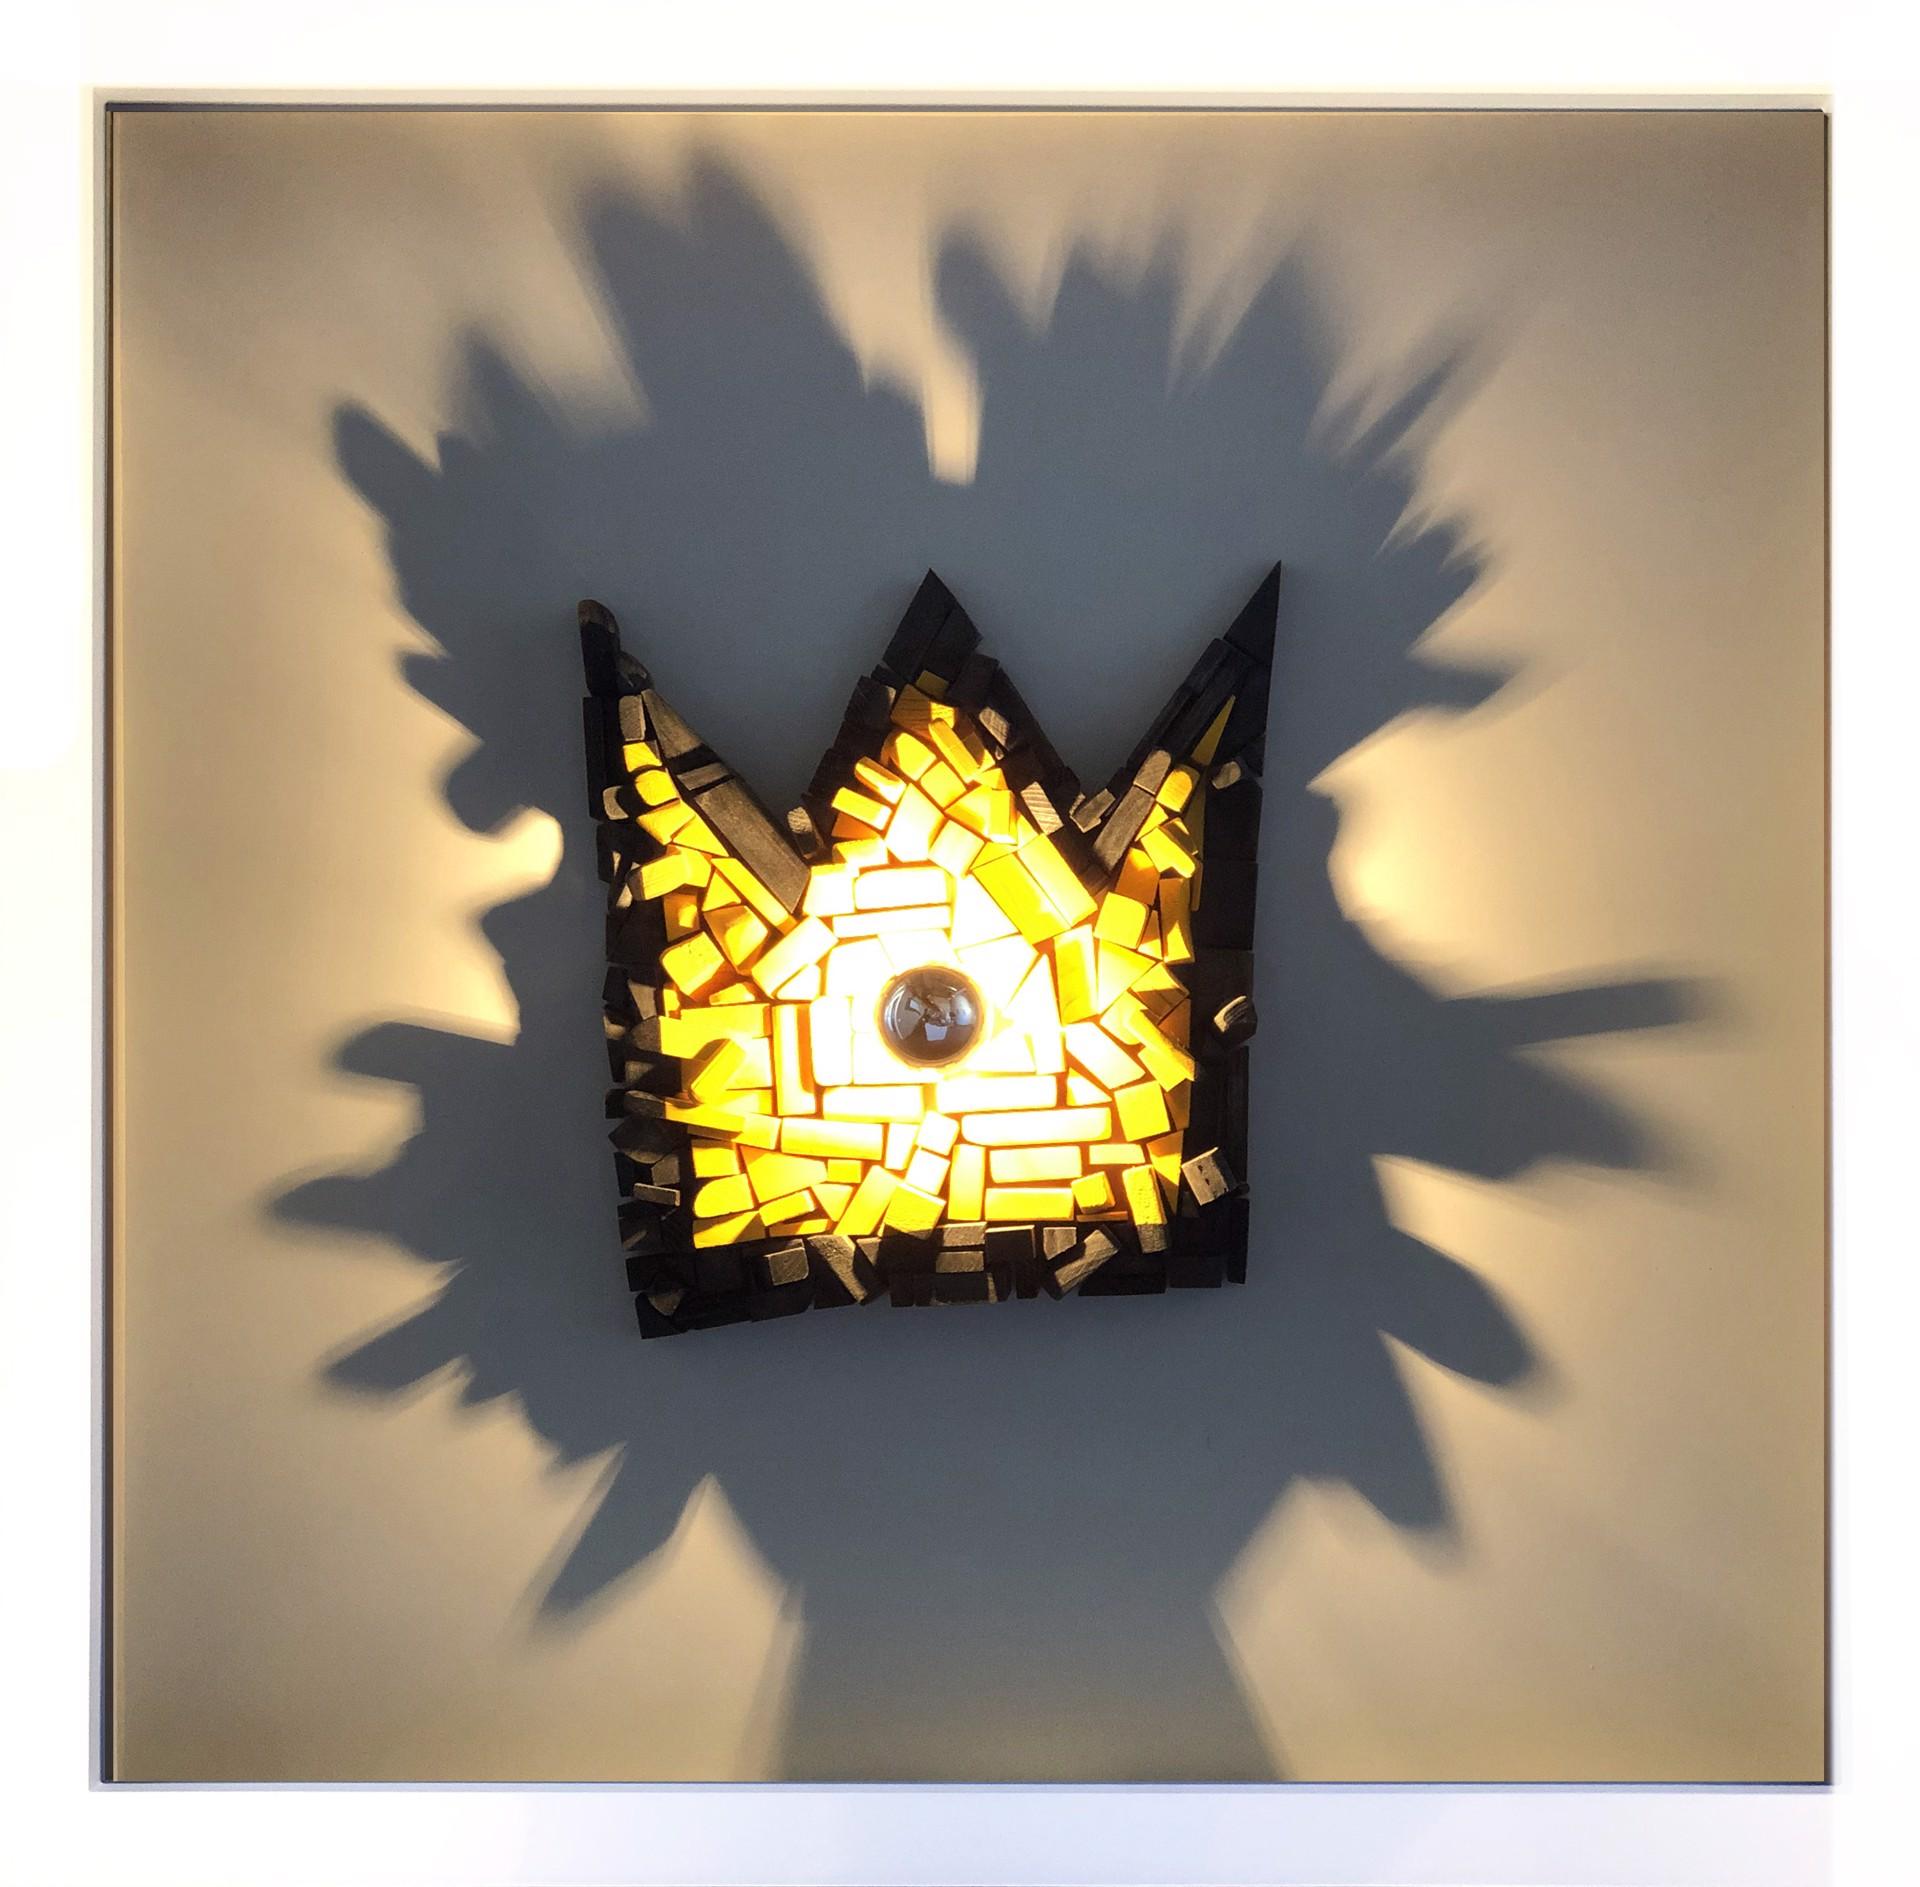 Basquiat  by J.P. Goncalves, Silhouette